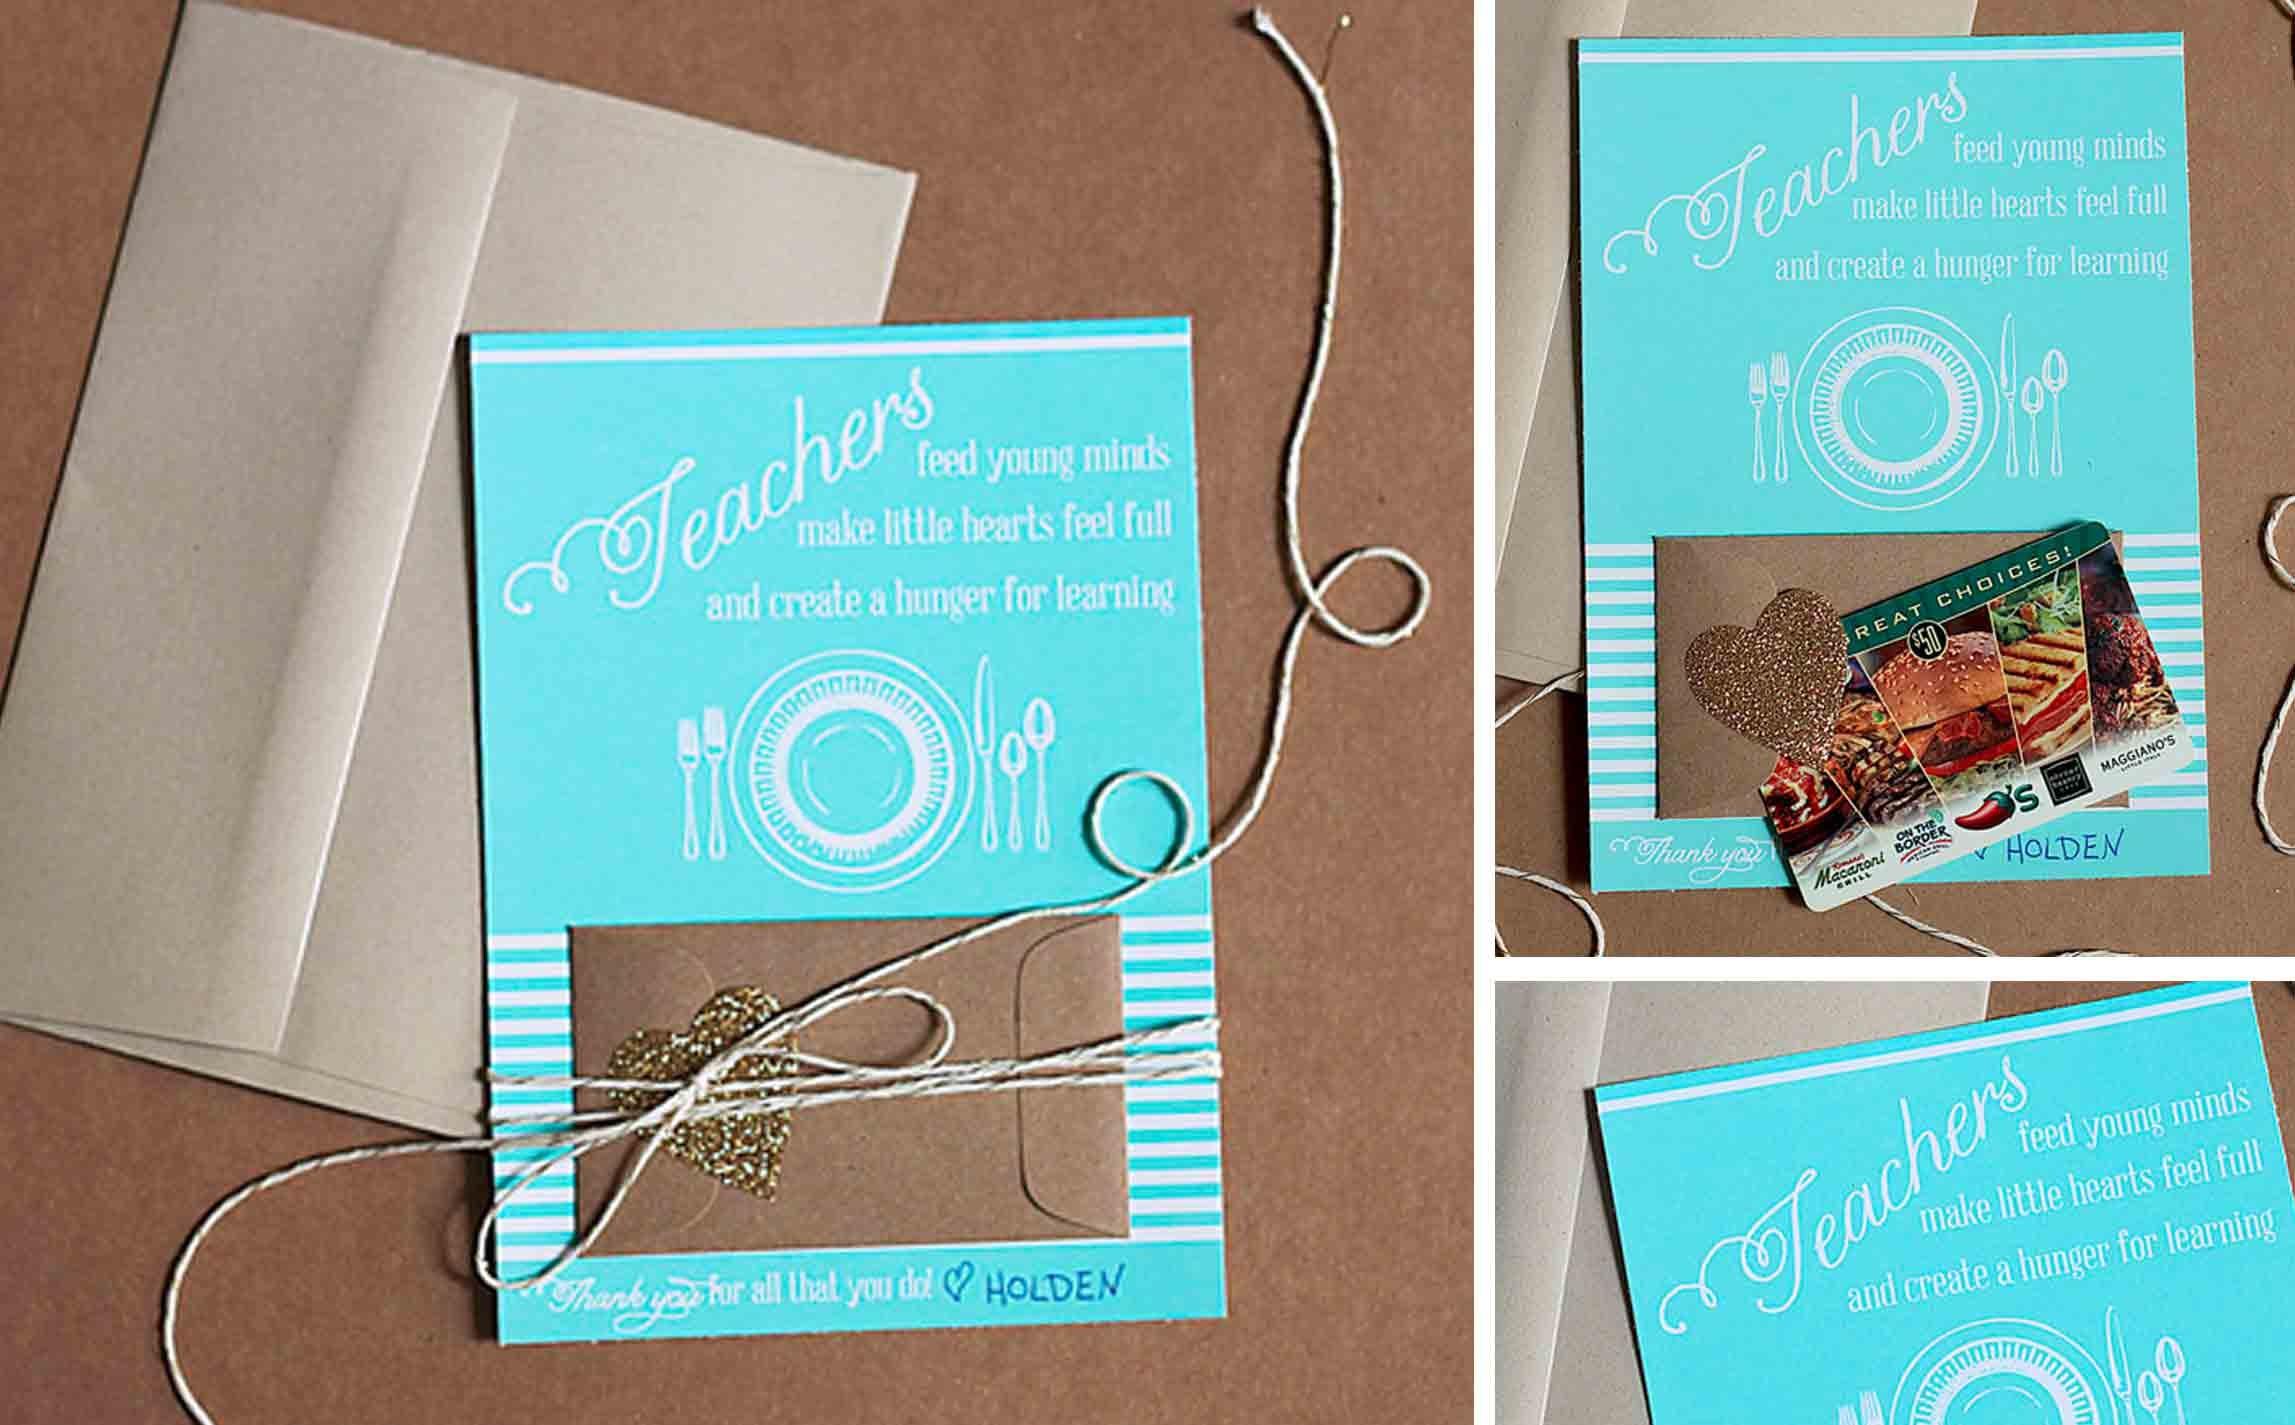 Over 50 Printable Gift Card Holders For The Holidays | Gcg - Make A Holiday Card For Free Printable